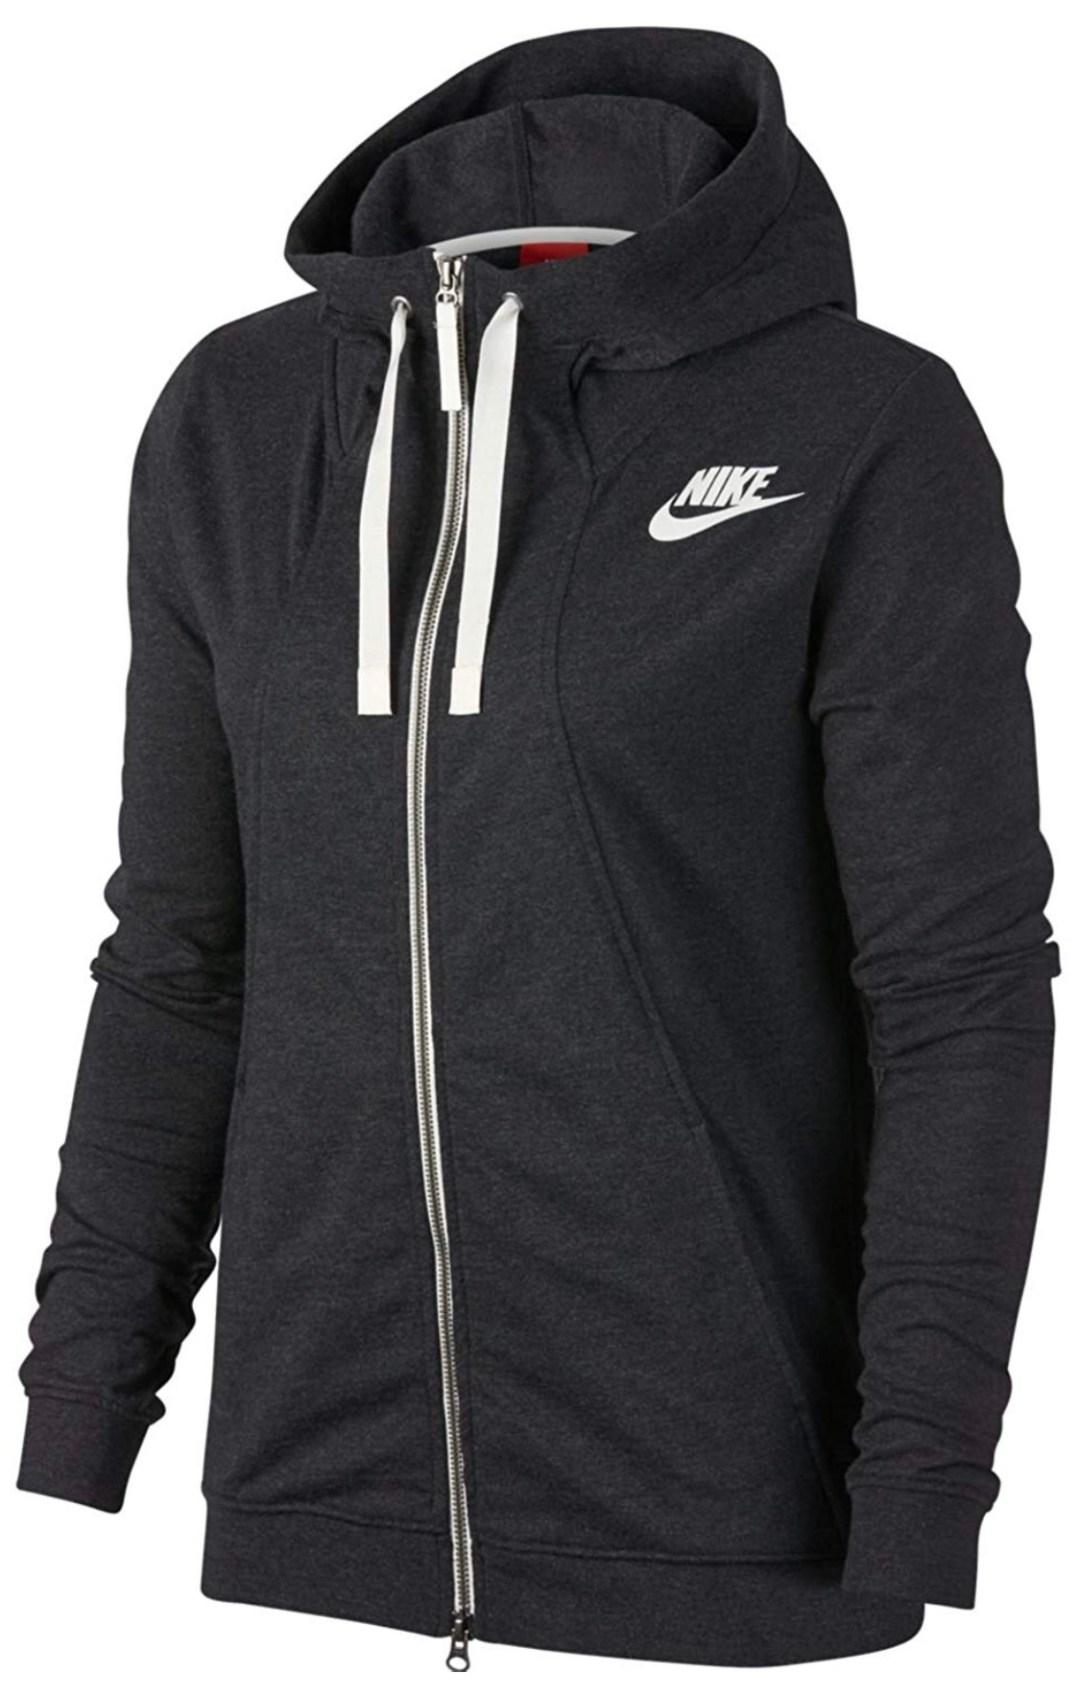 Nike Women's Classic Full Zip Hooded Sweatshirt